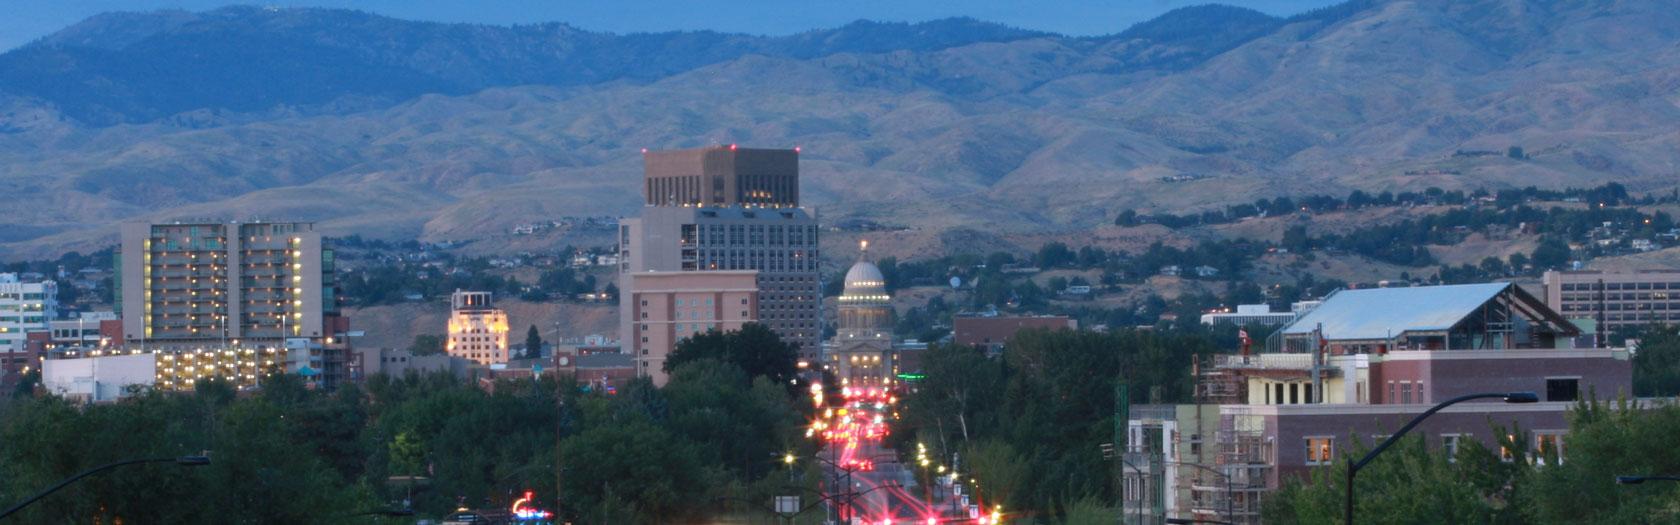 ANTLER RIDGE  Boise